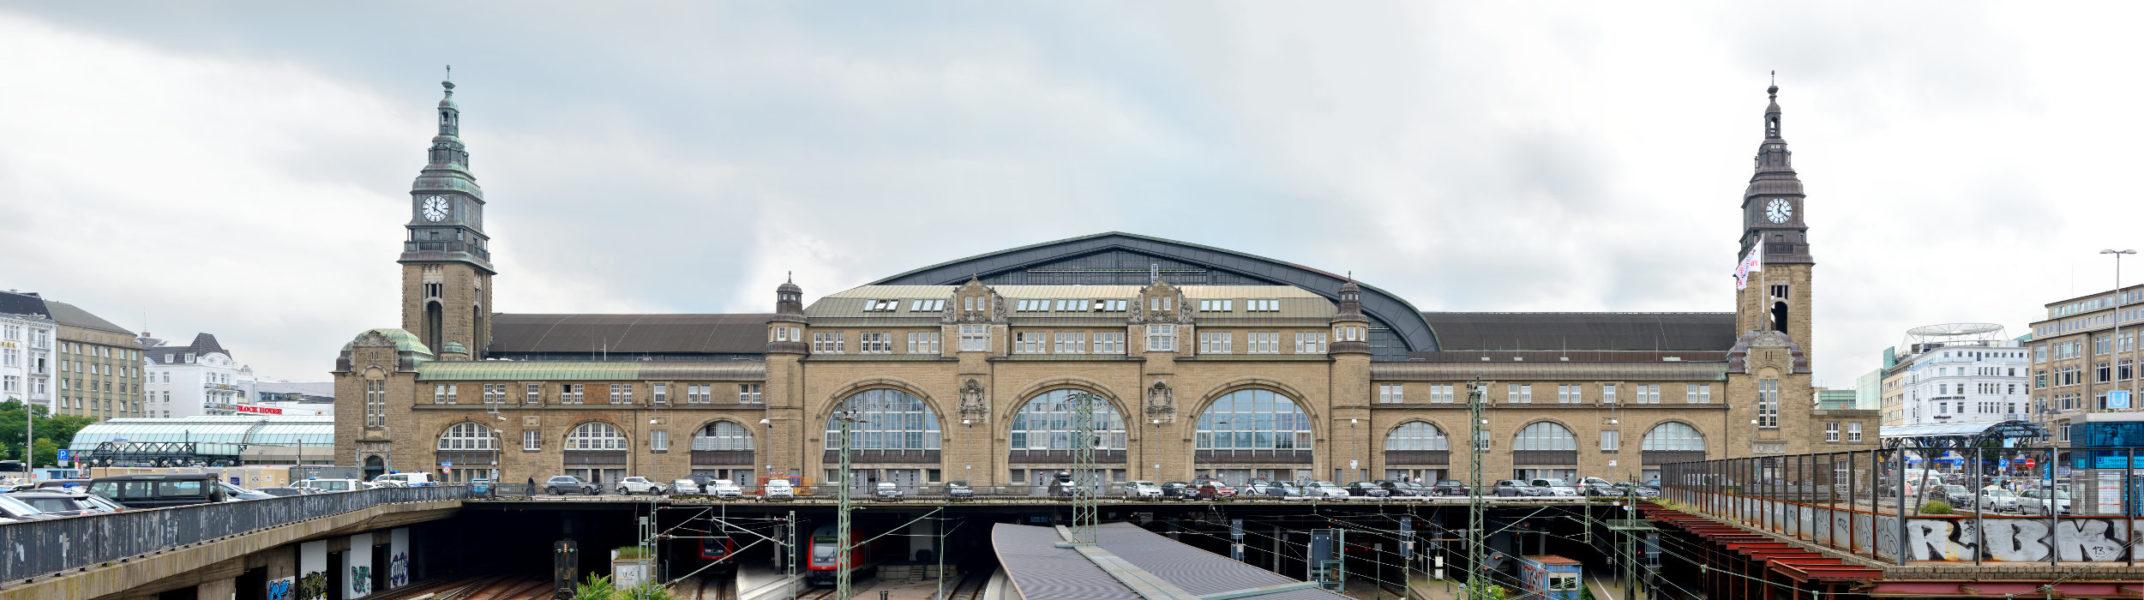 Hauptbahnhof Nordfassade